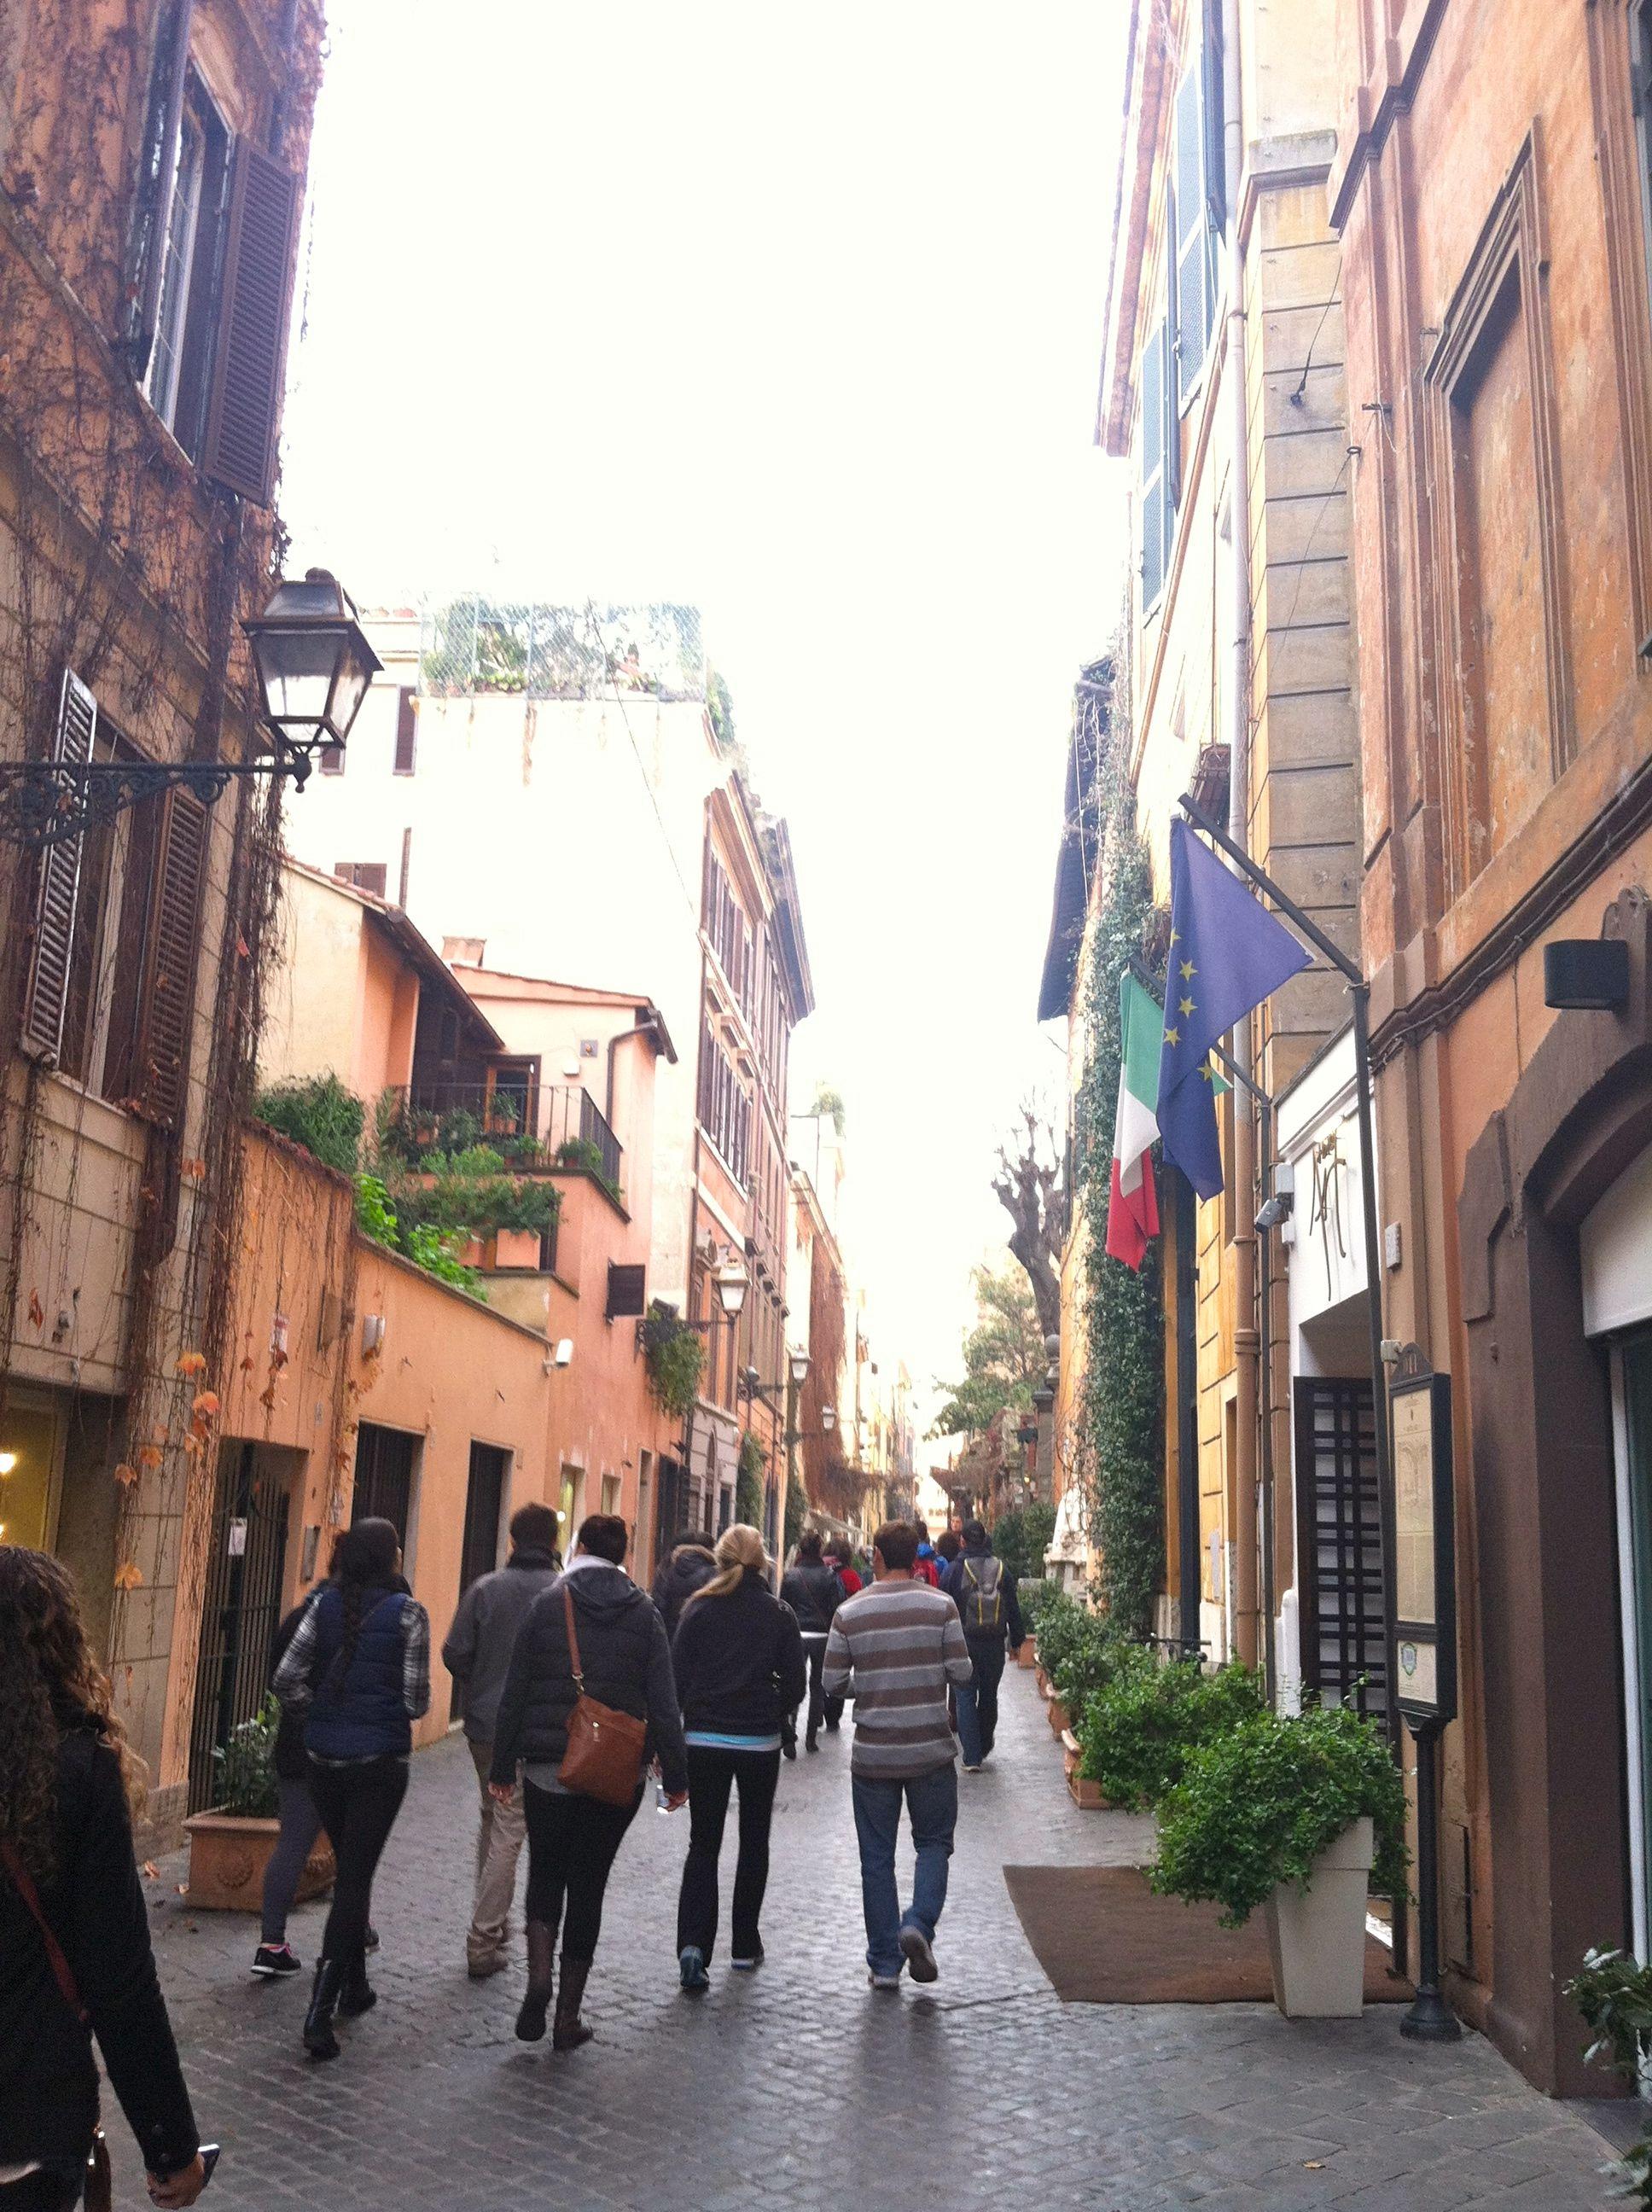 Roaming through Roma